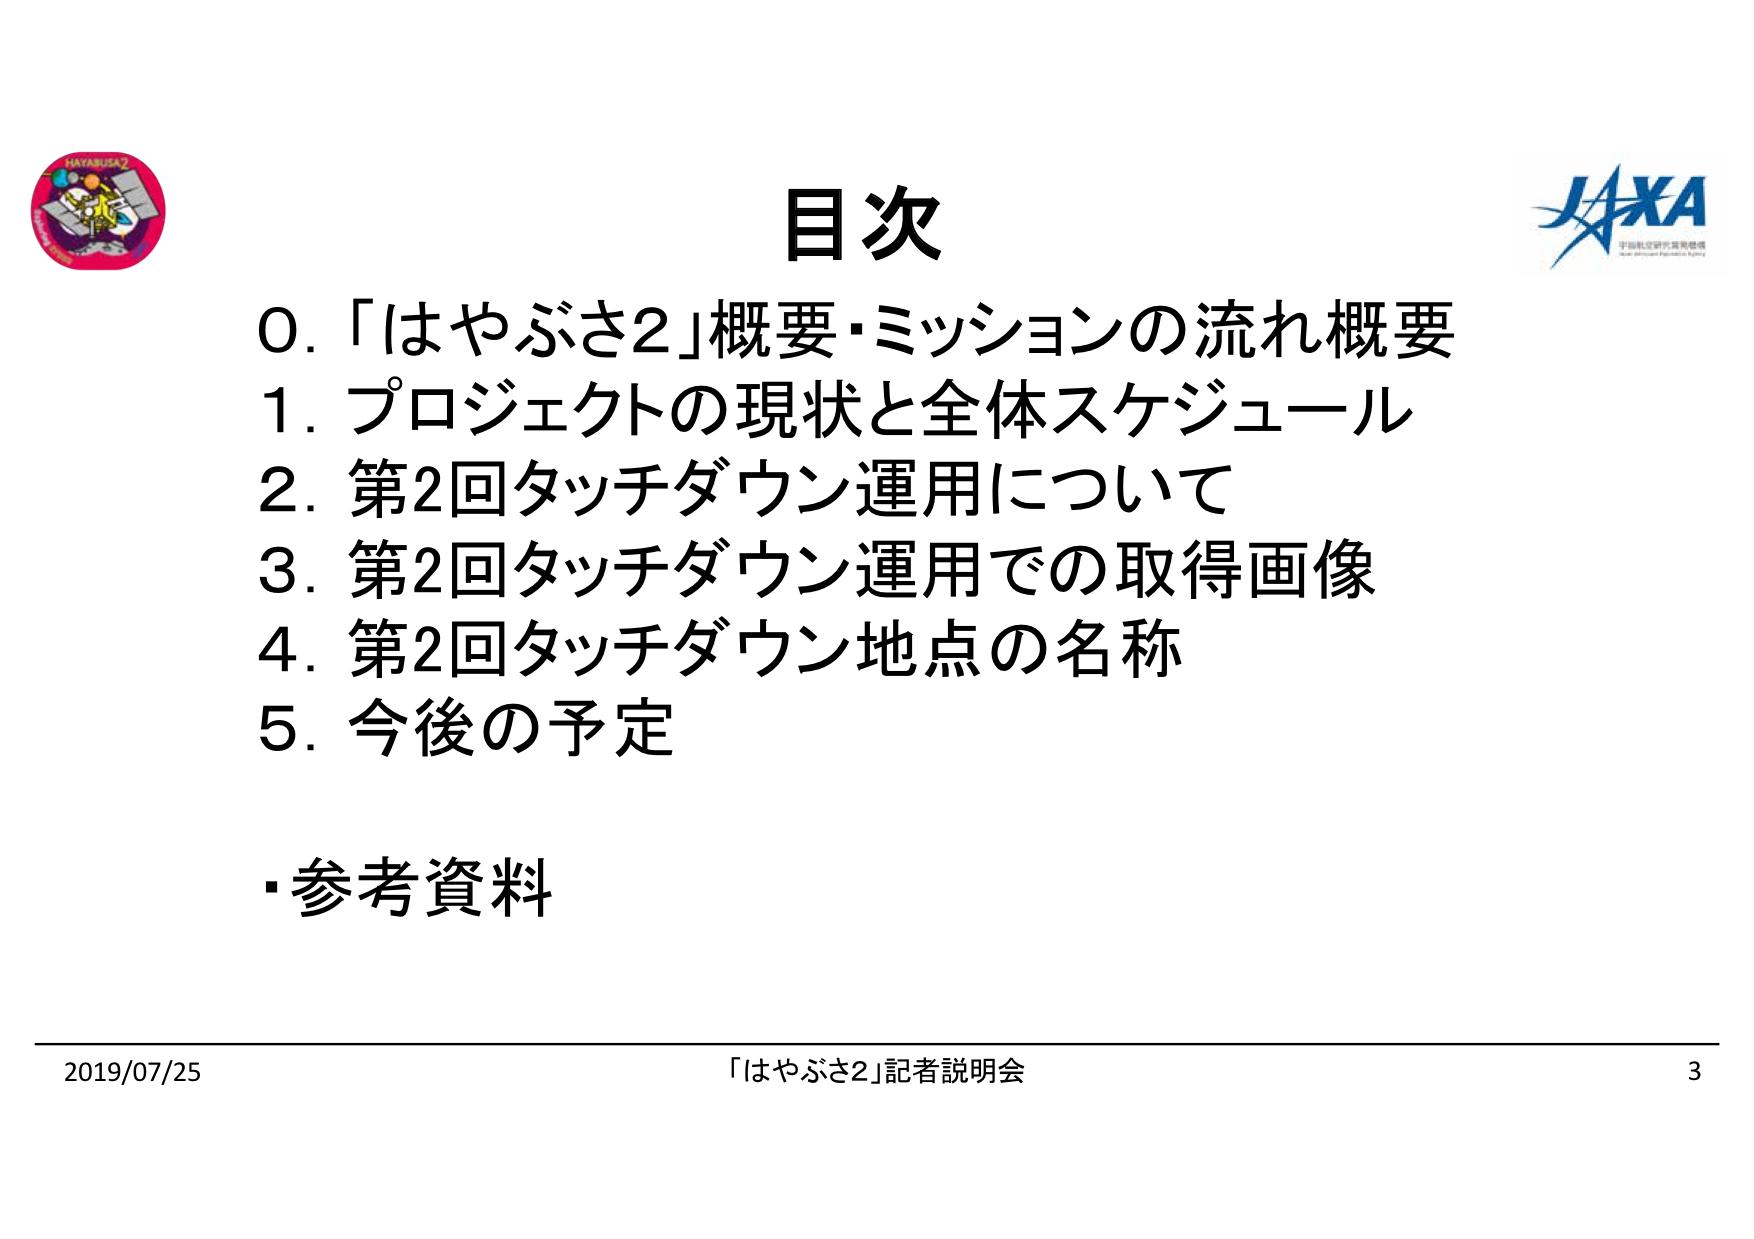 f:id:Imamura:20190725151047p:plain